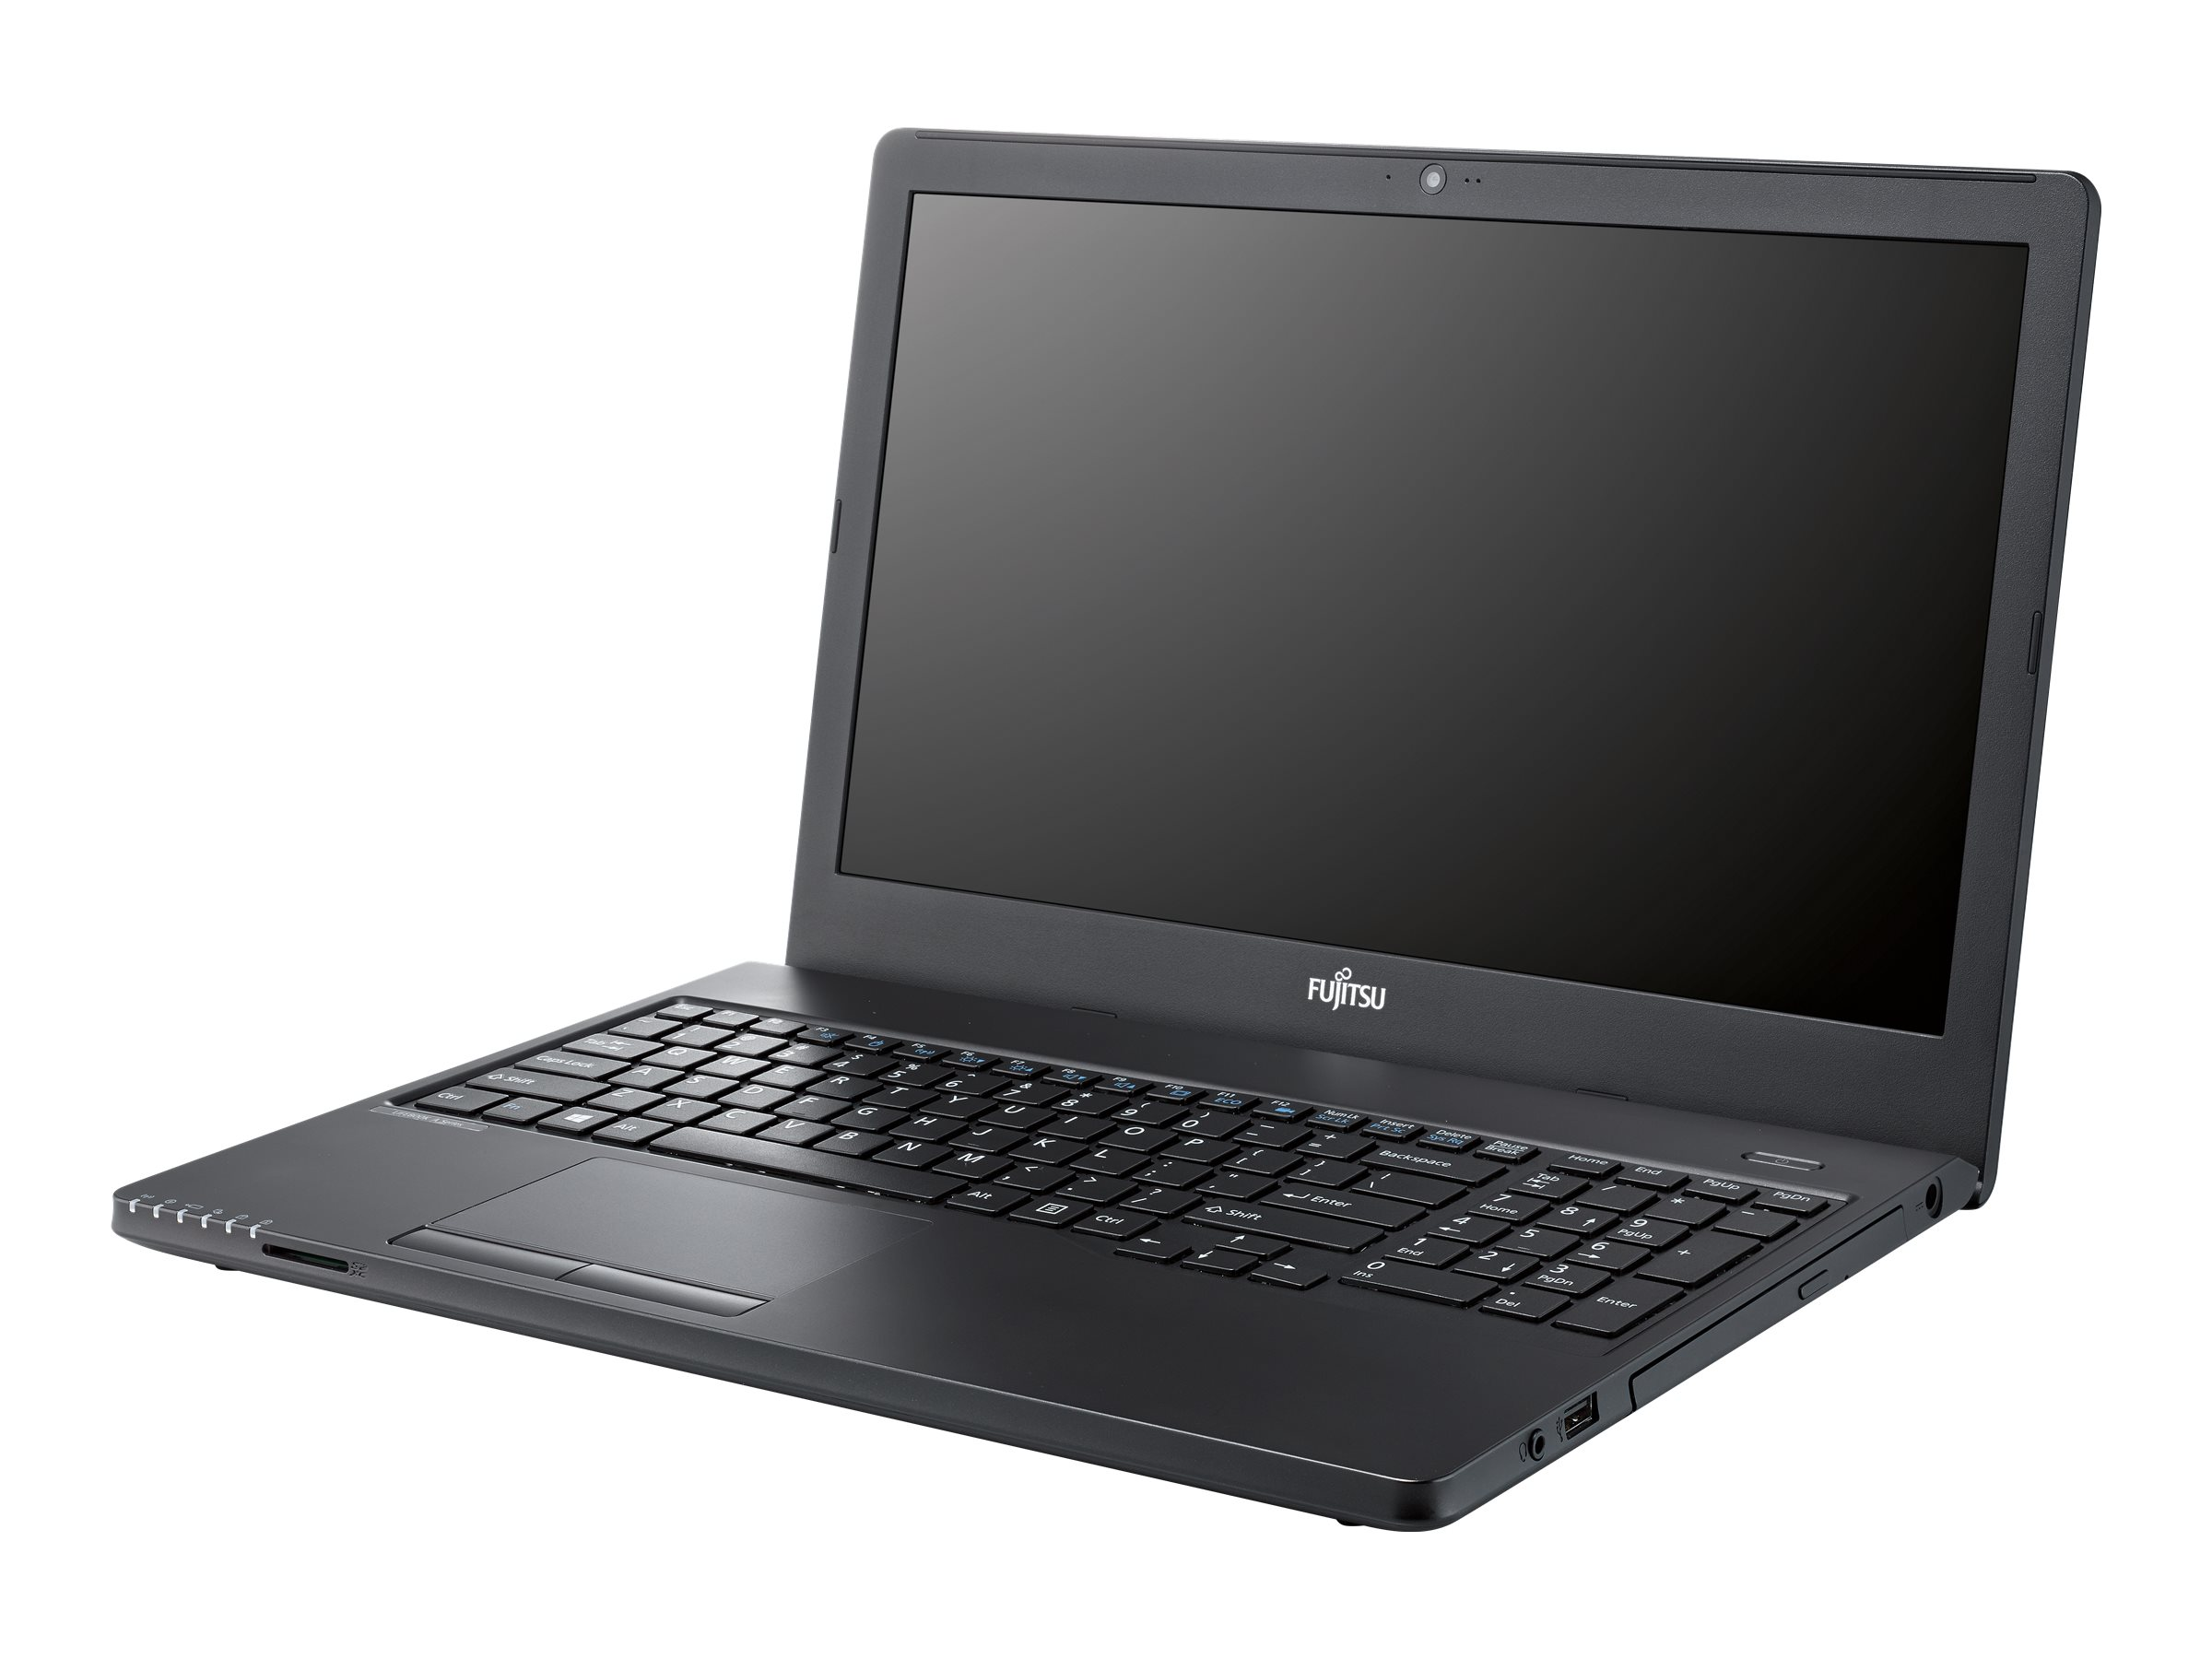 "Fujitsu LIFEBOOK A359 - Core i5 8250U / 1.6 GHz - Win 10 Pro - 8 GB RAM - 256 GB SSD - DVD SuperMulti - 39.6 cm (15.6"")"